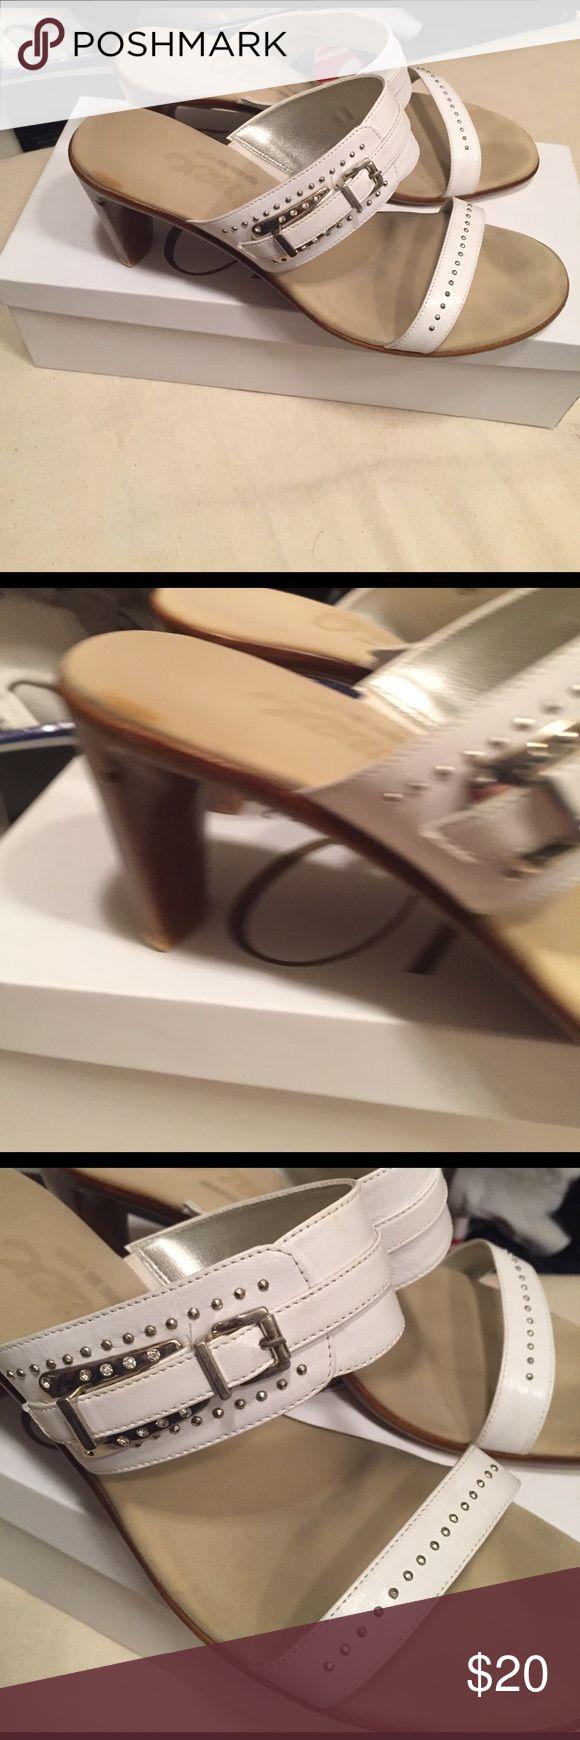 White slip on heel Slip on heel with buckle and studs. Slightly worn onex Shoes Heels